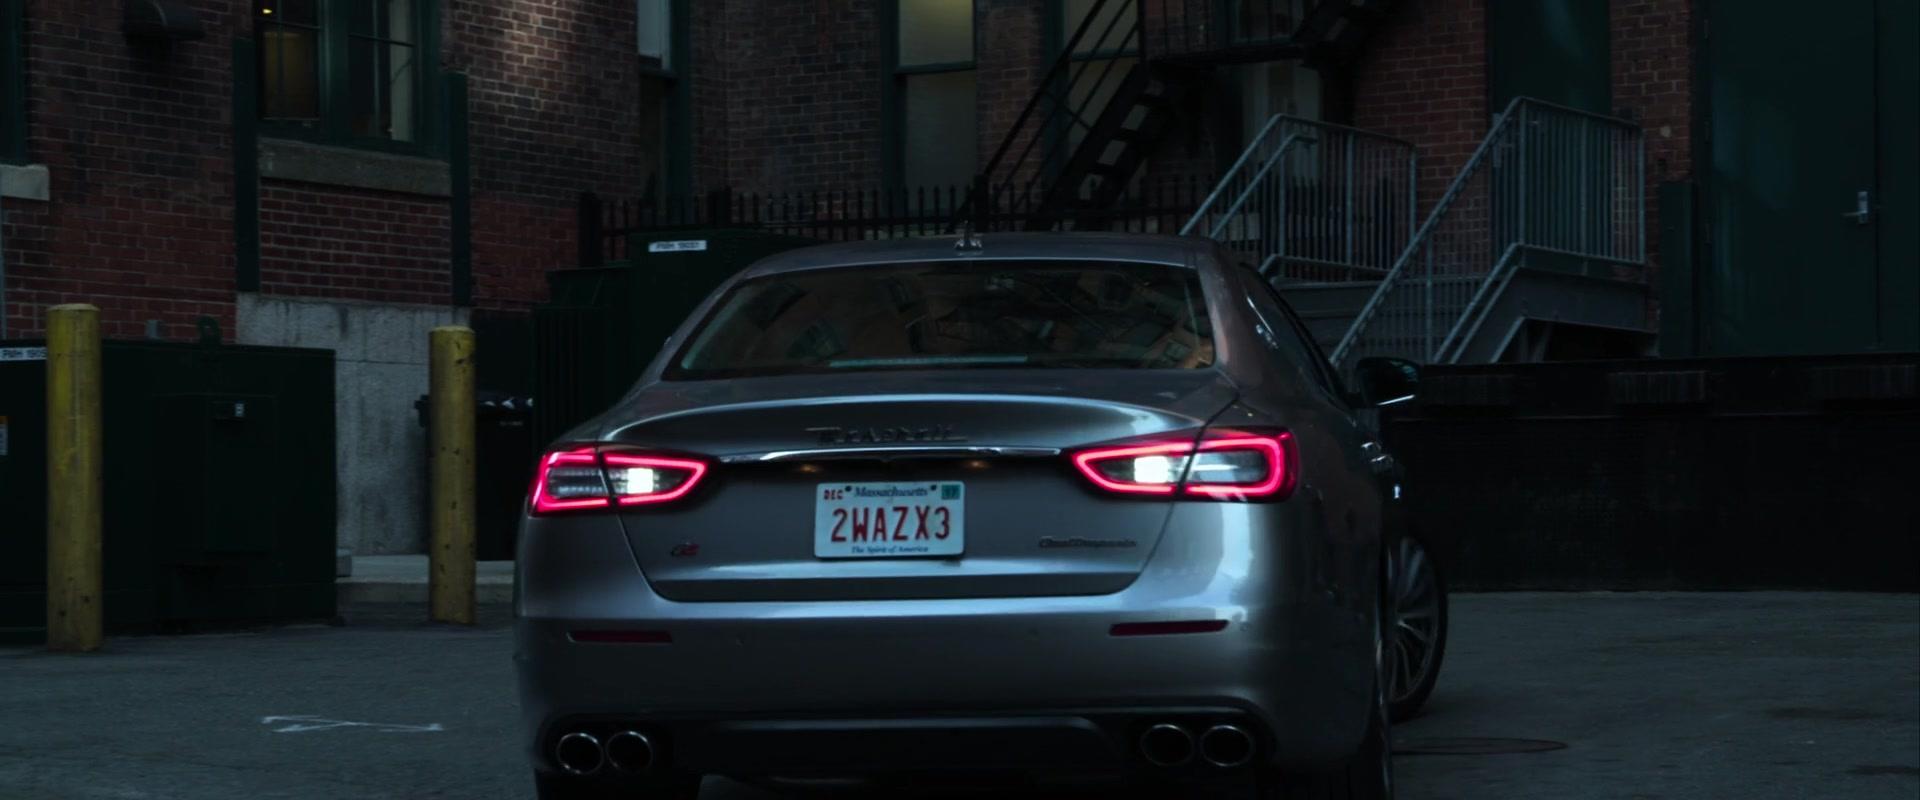 2017 Maserati Quattroporte S Q4 >> Maserati Quattroporte Q4 Car Driven by Taraji P. Henson in Proud Mary (2018) Movie